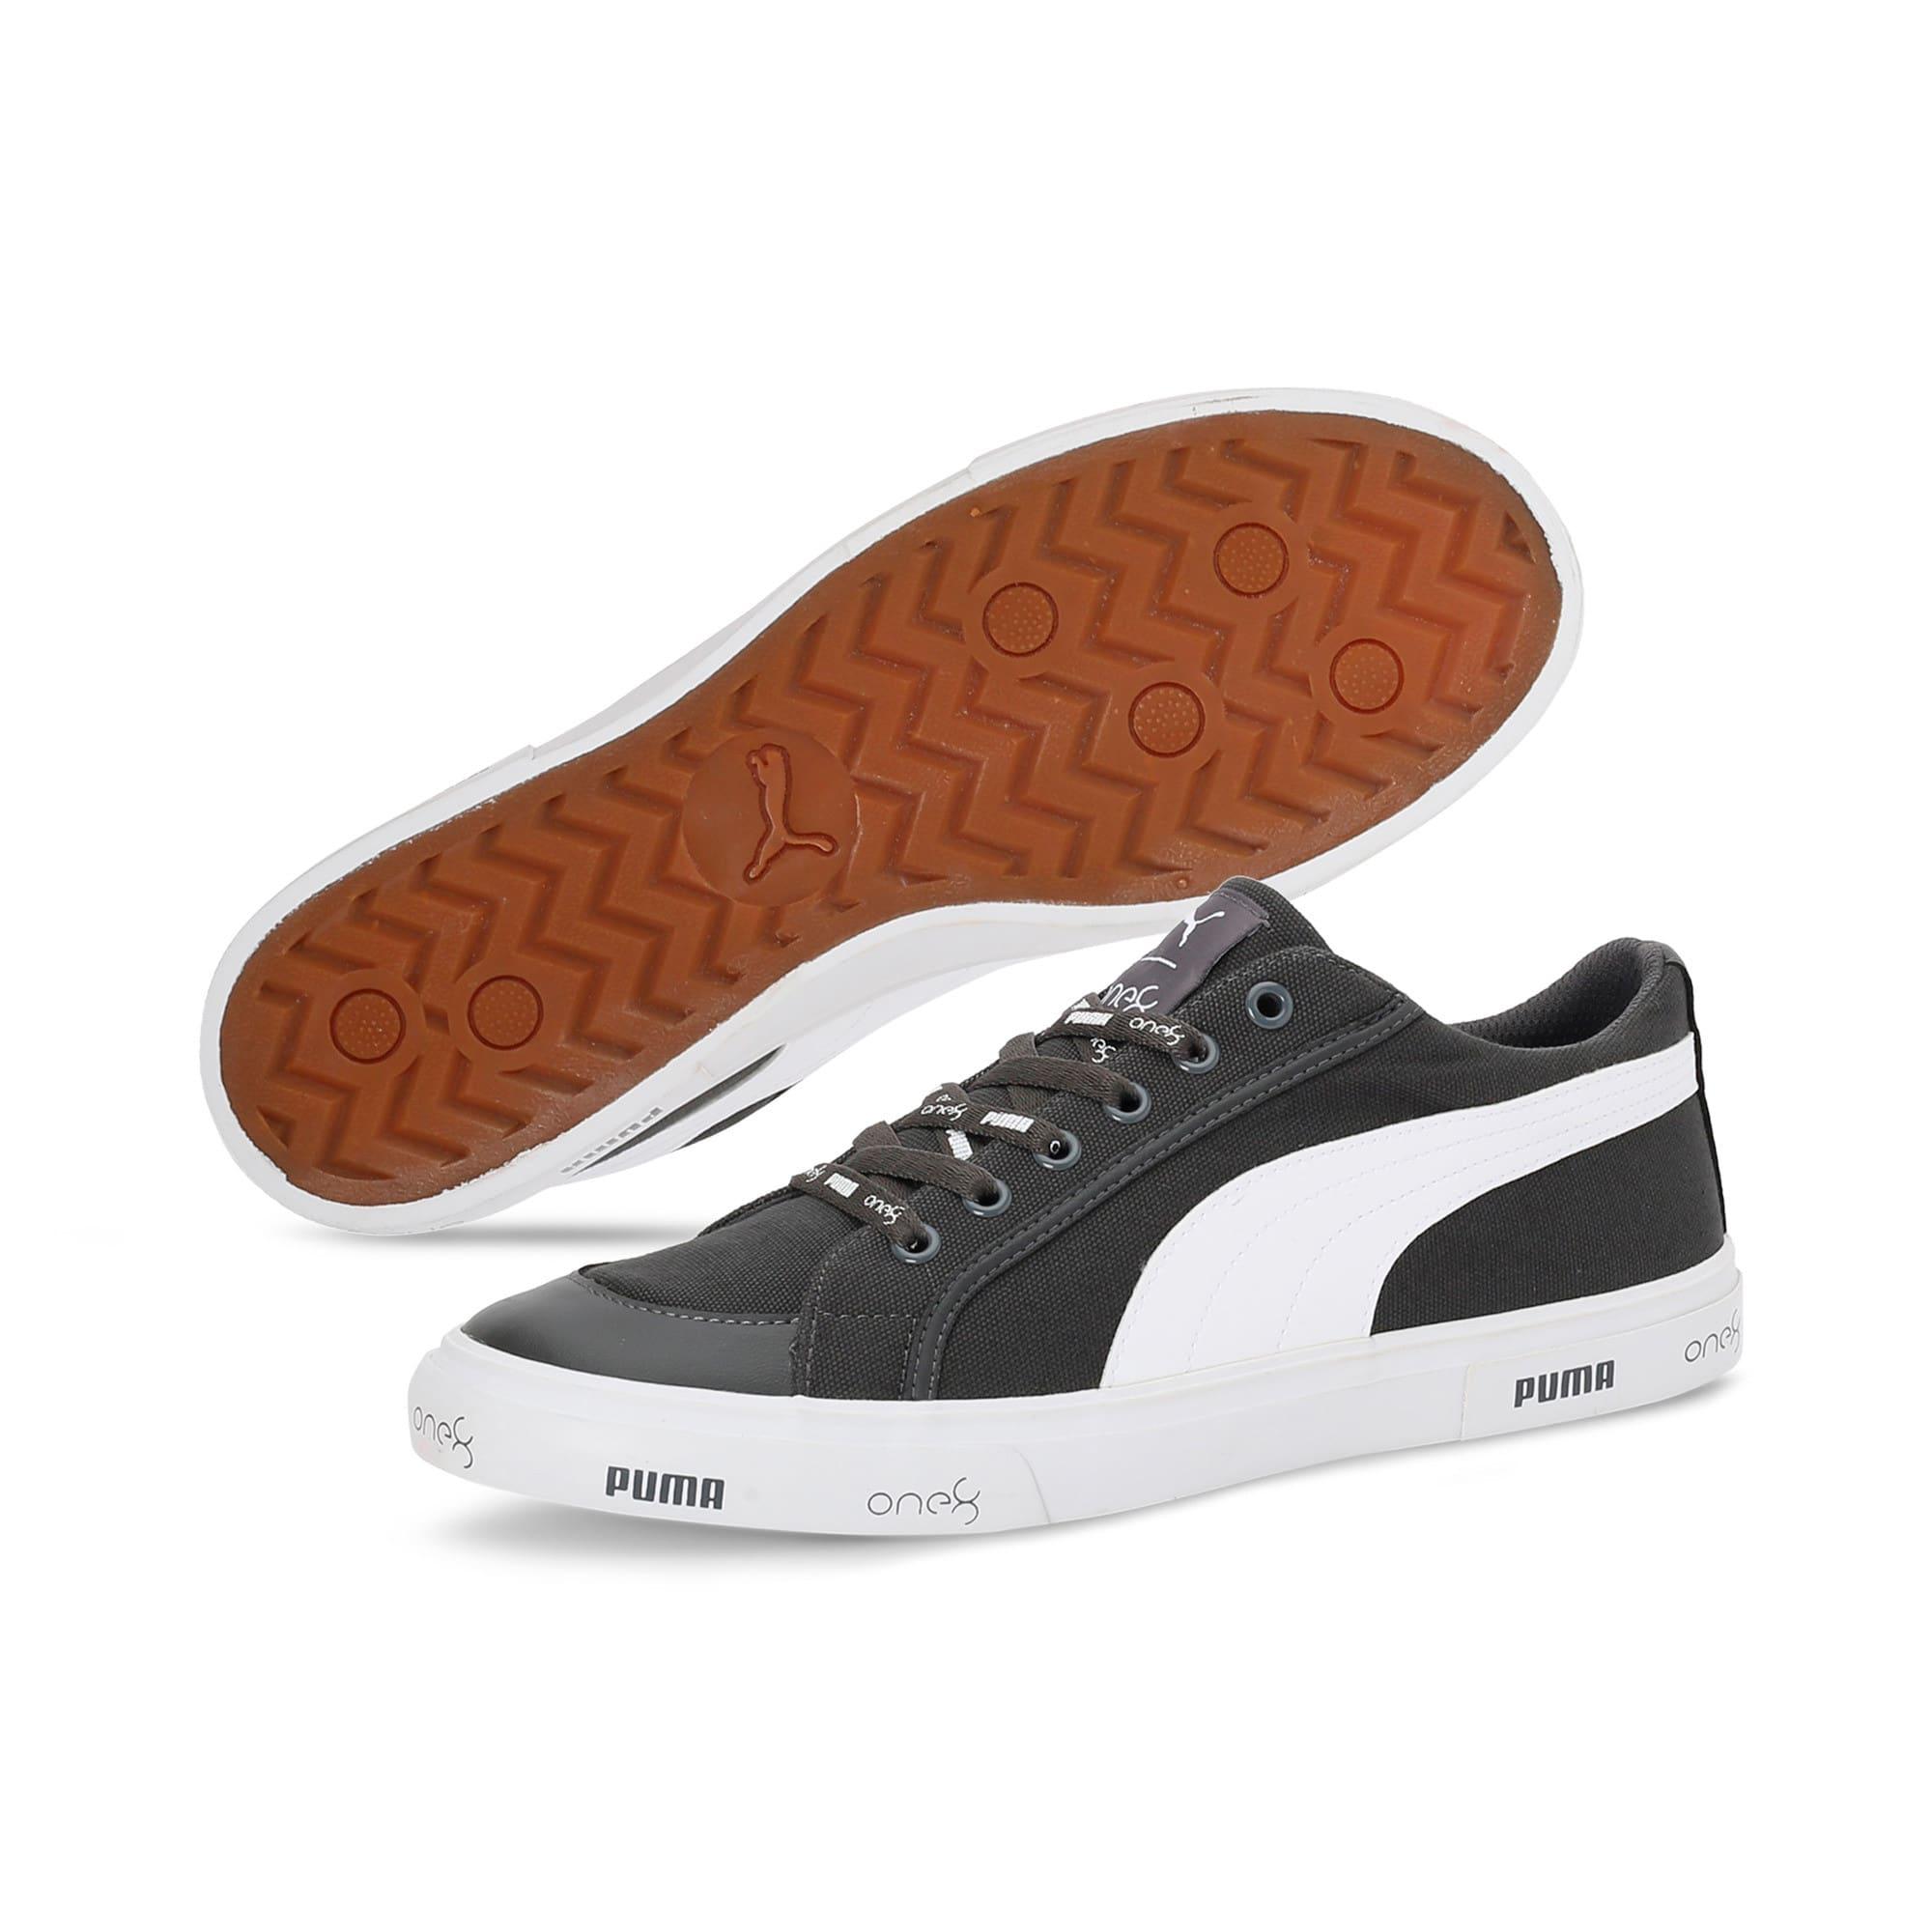 Thumbnail 2 of one8 V2 IDP Men's Sneakers, Iron Gate-Puma White, medium-IND